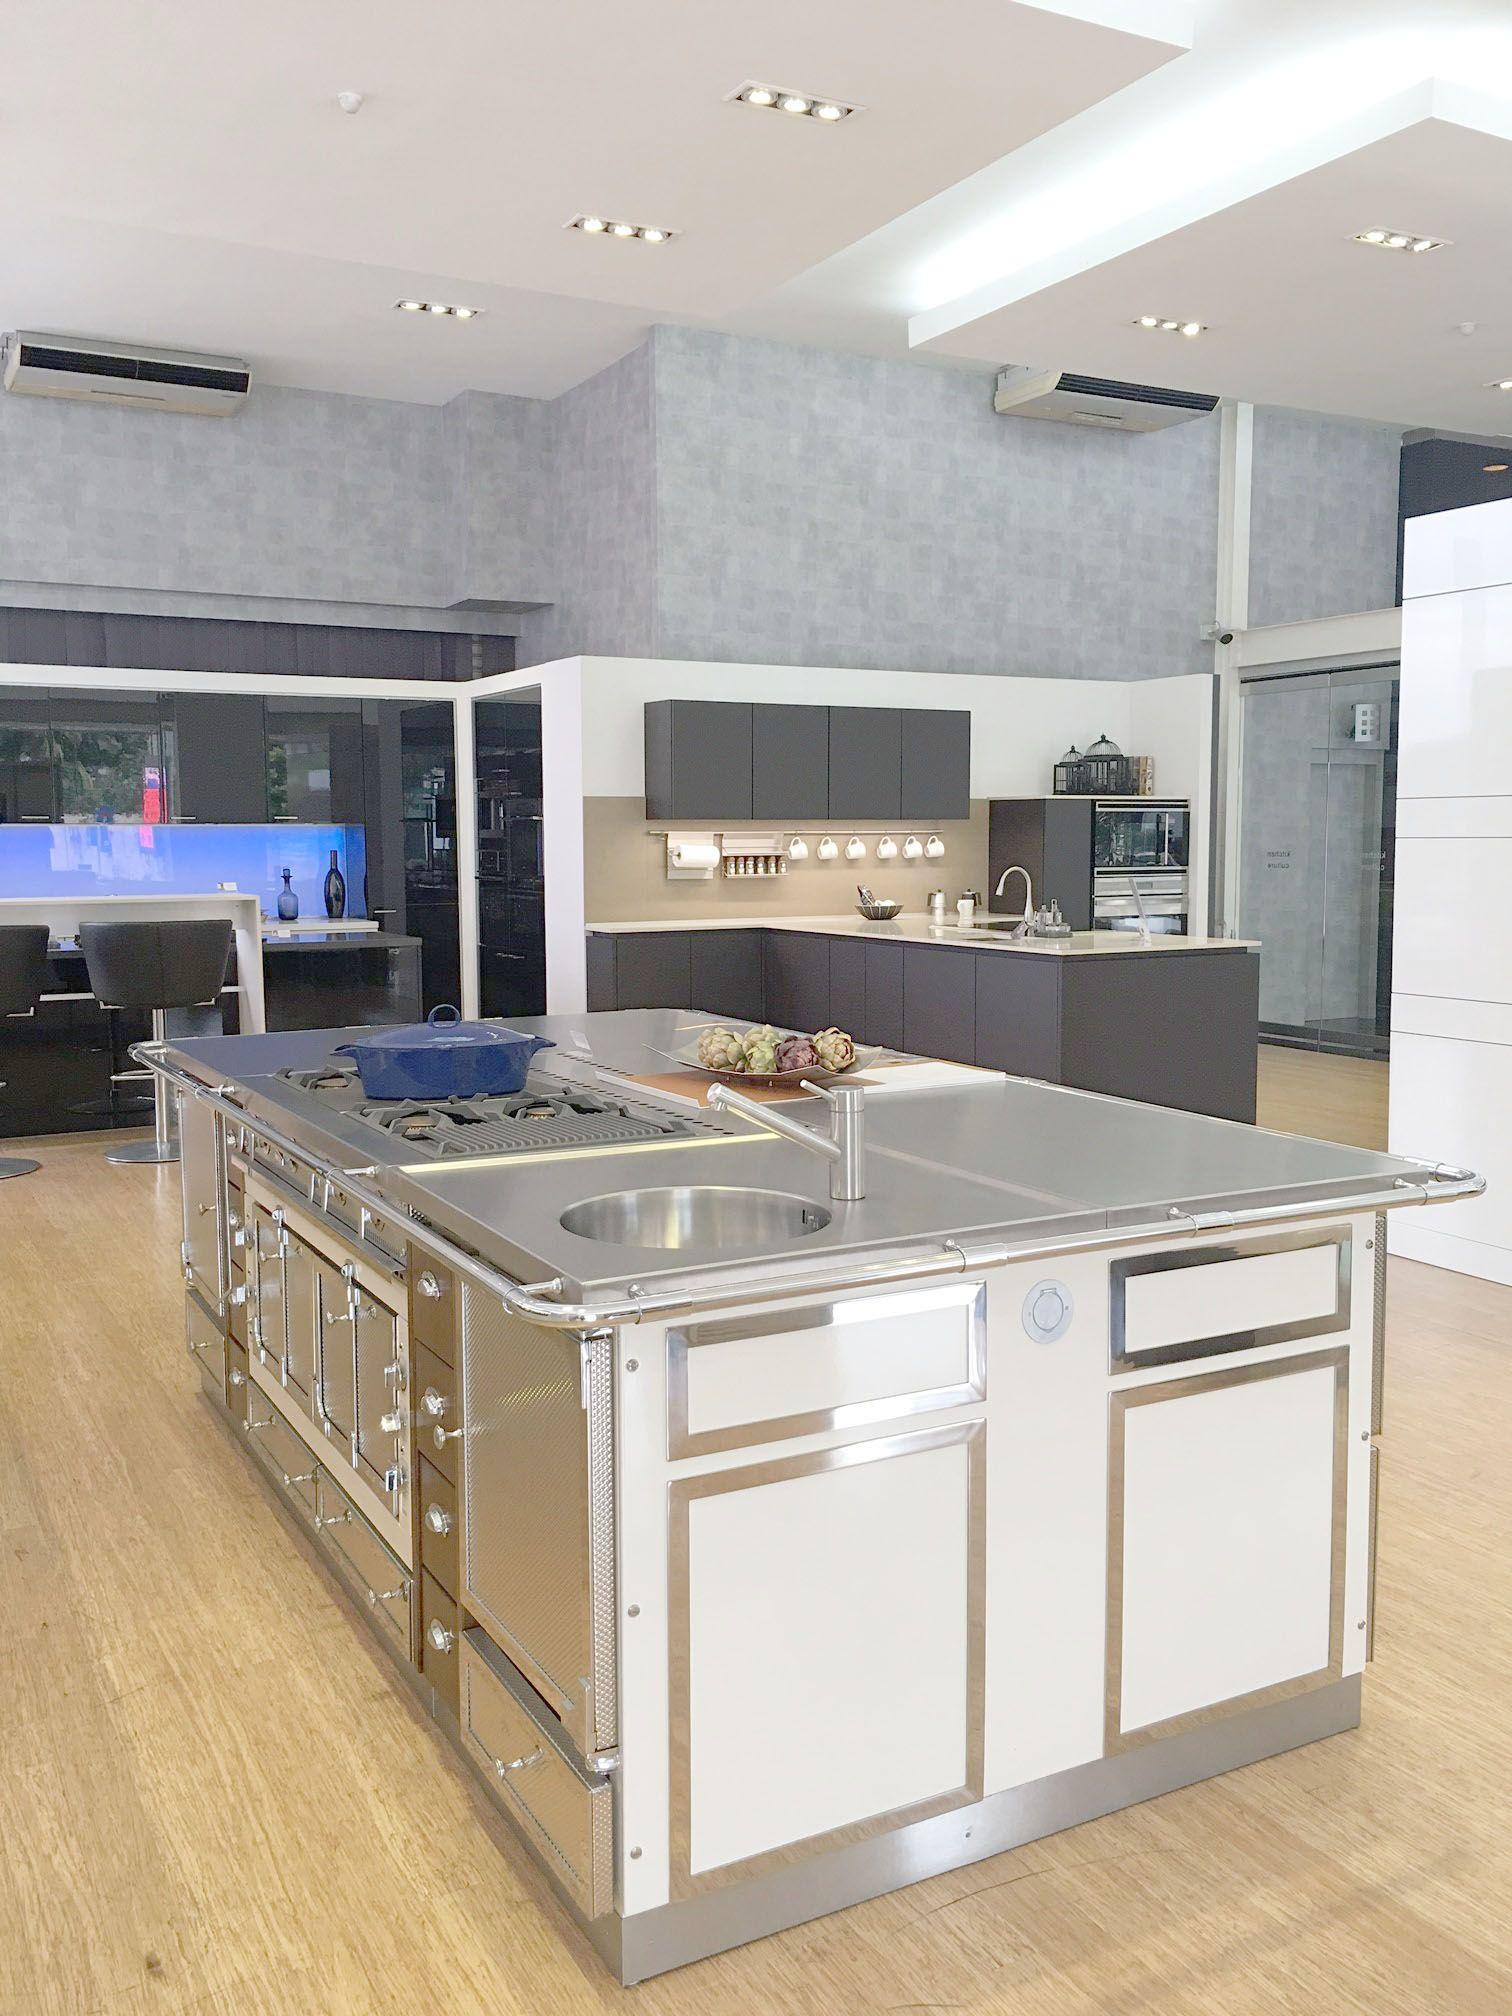 lot la cornue ch teau 120 lotus showroom de kuala lumpur kitchen culture new york. Black Bedroom Furniture Sets. Home Design Ideas